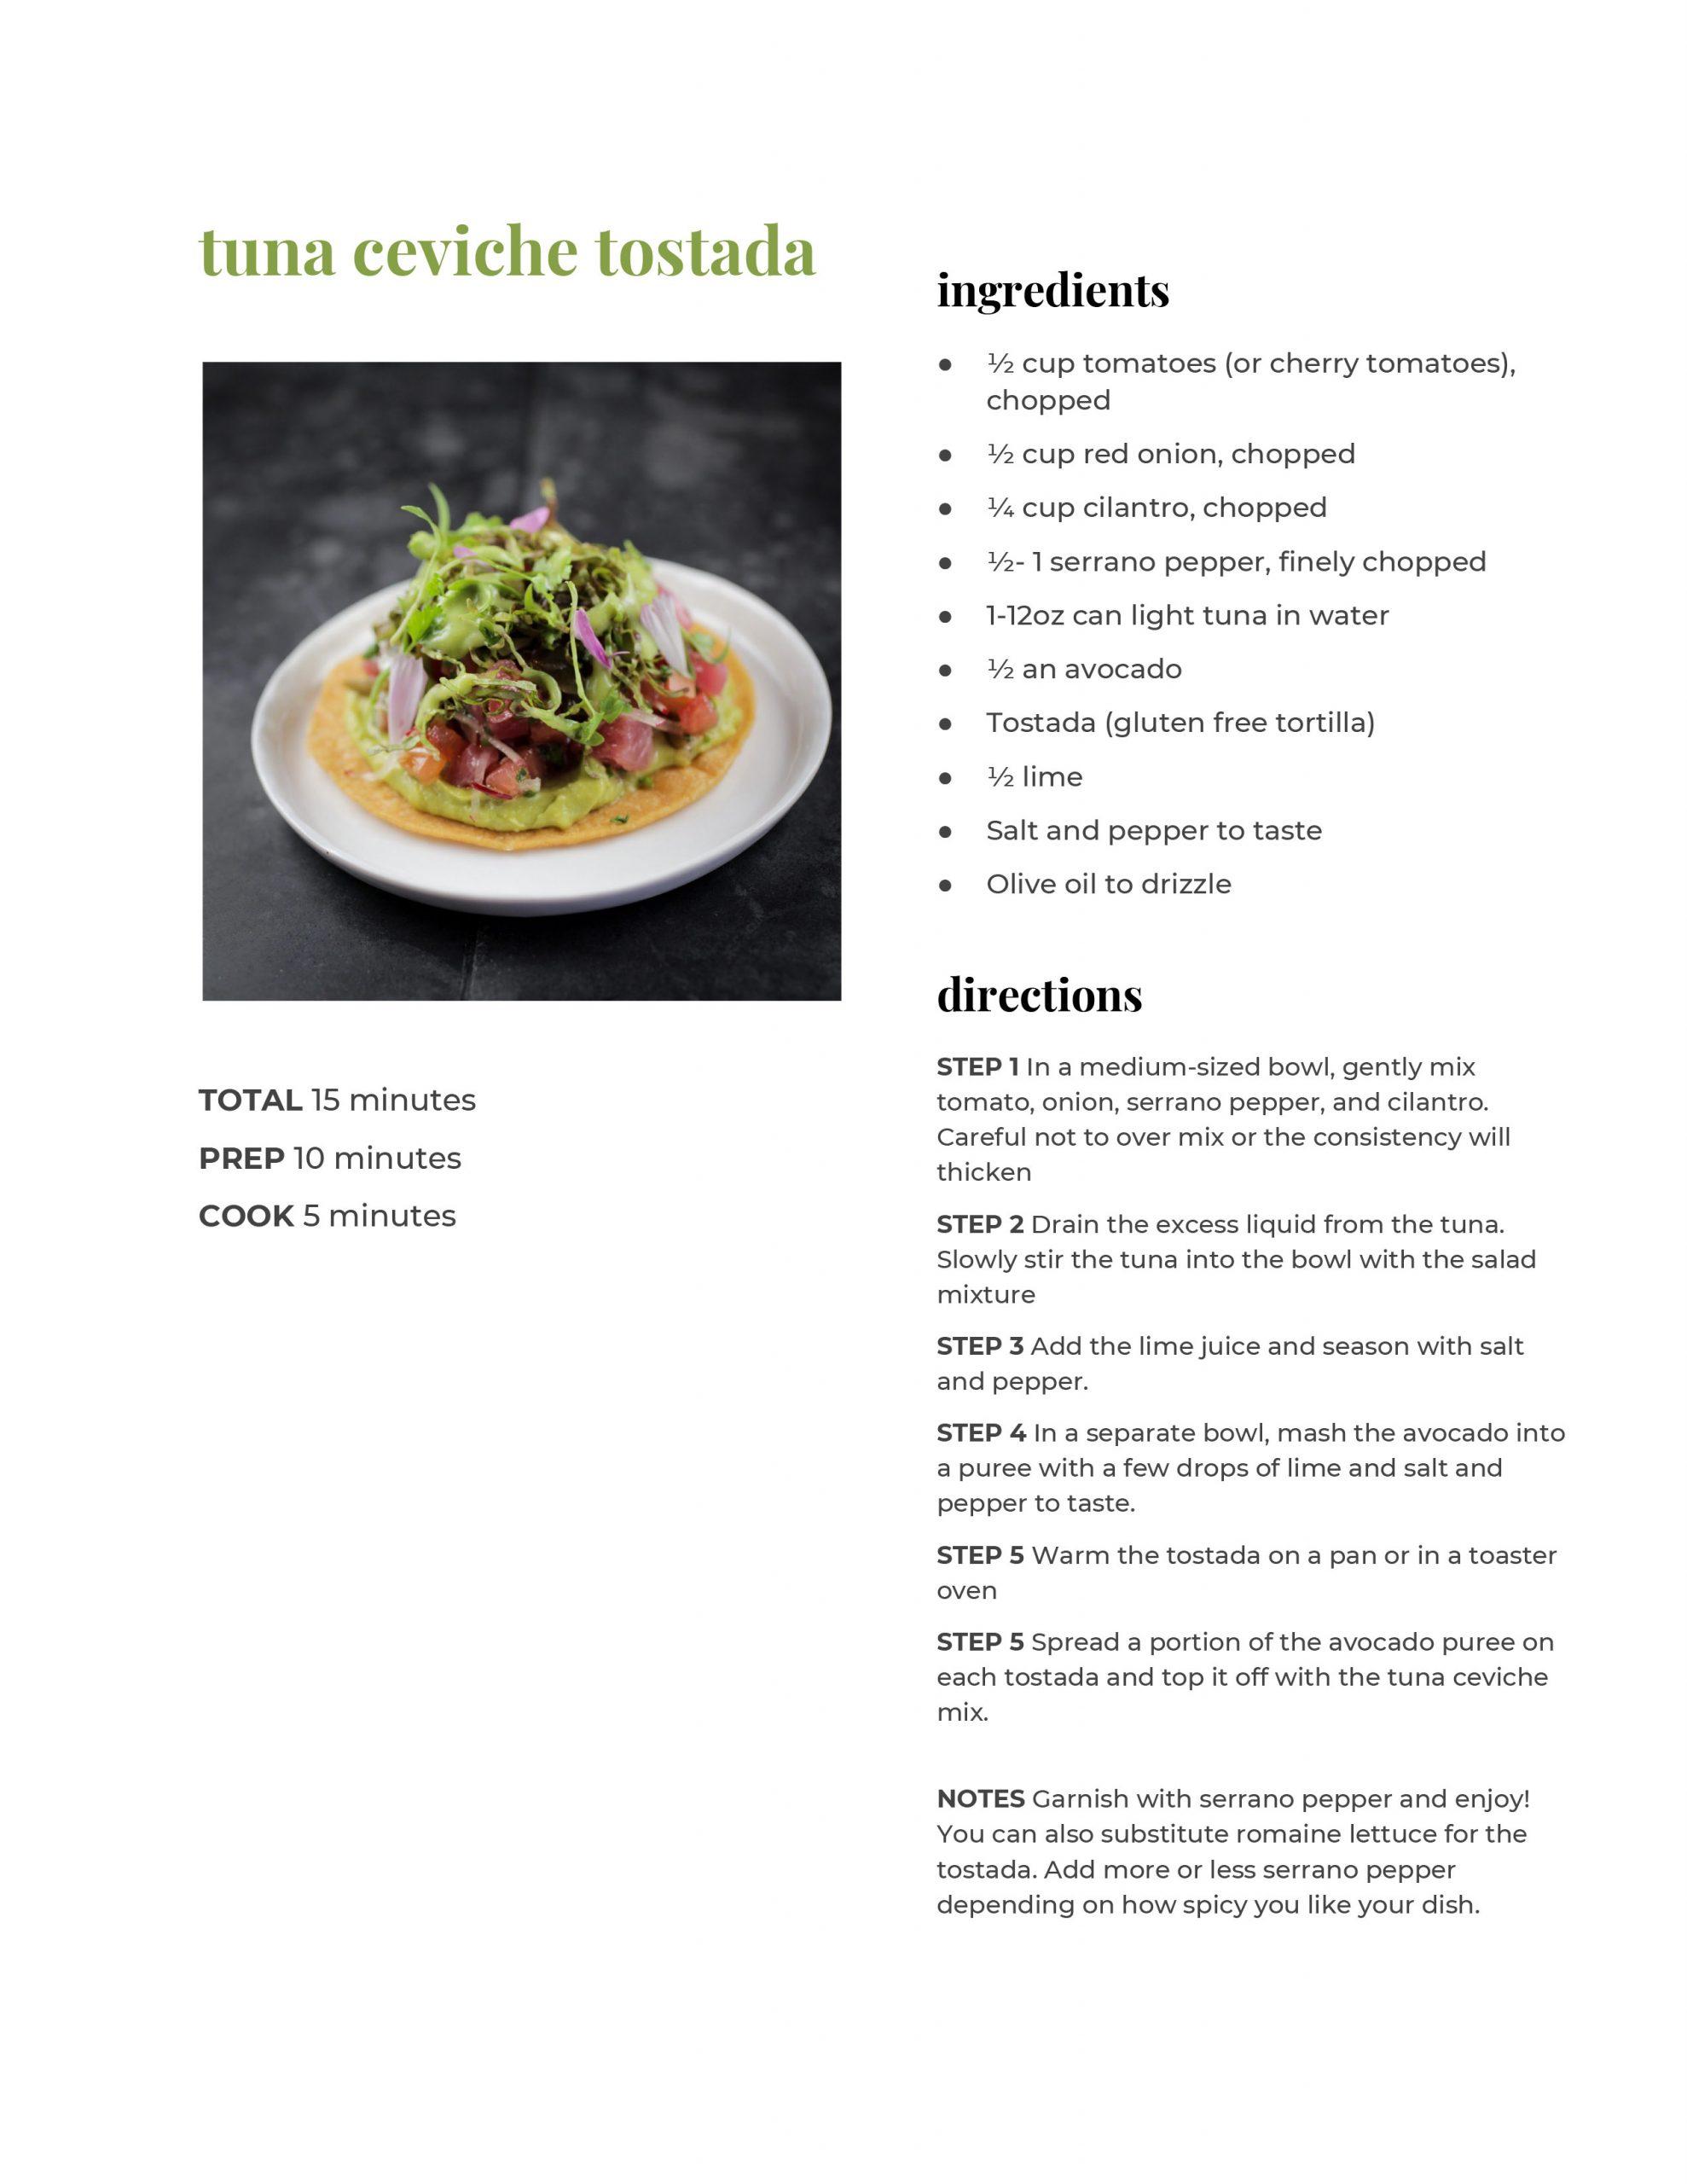 Tuna Ceviche Tostada Recipe